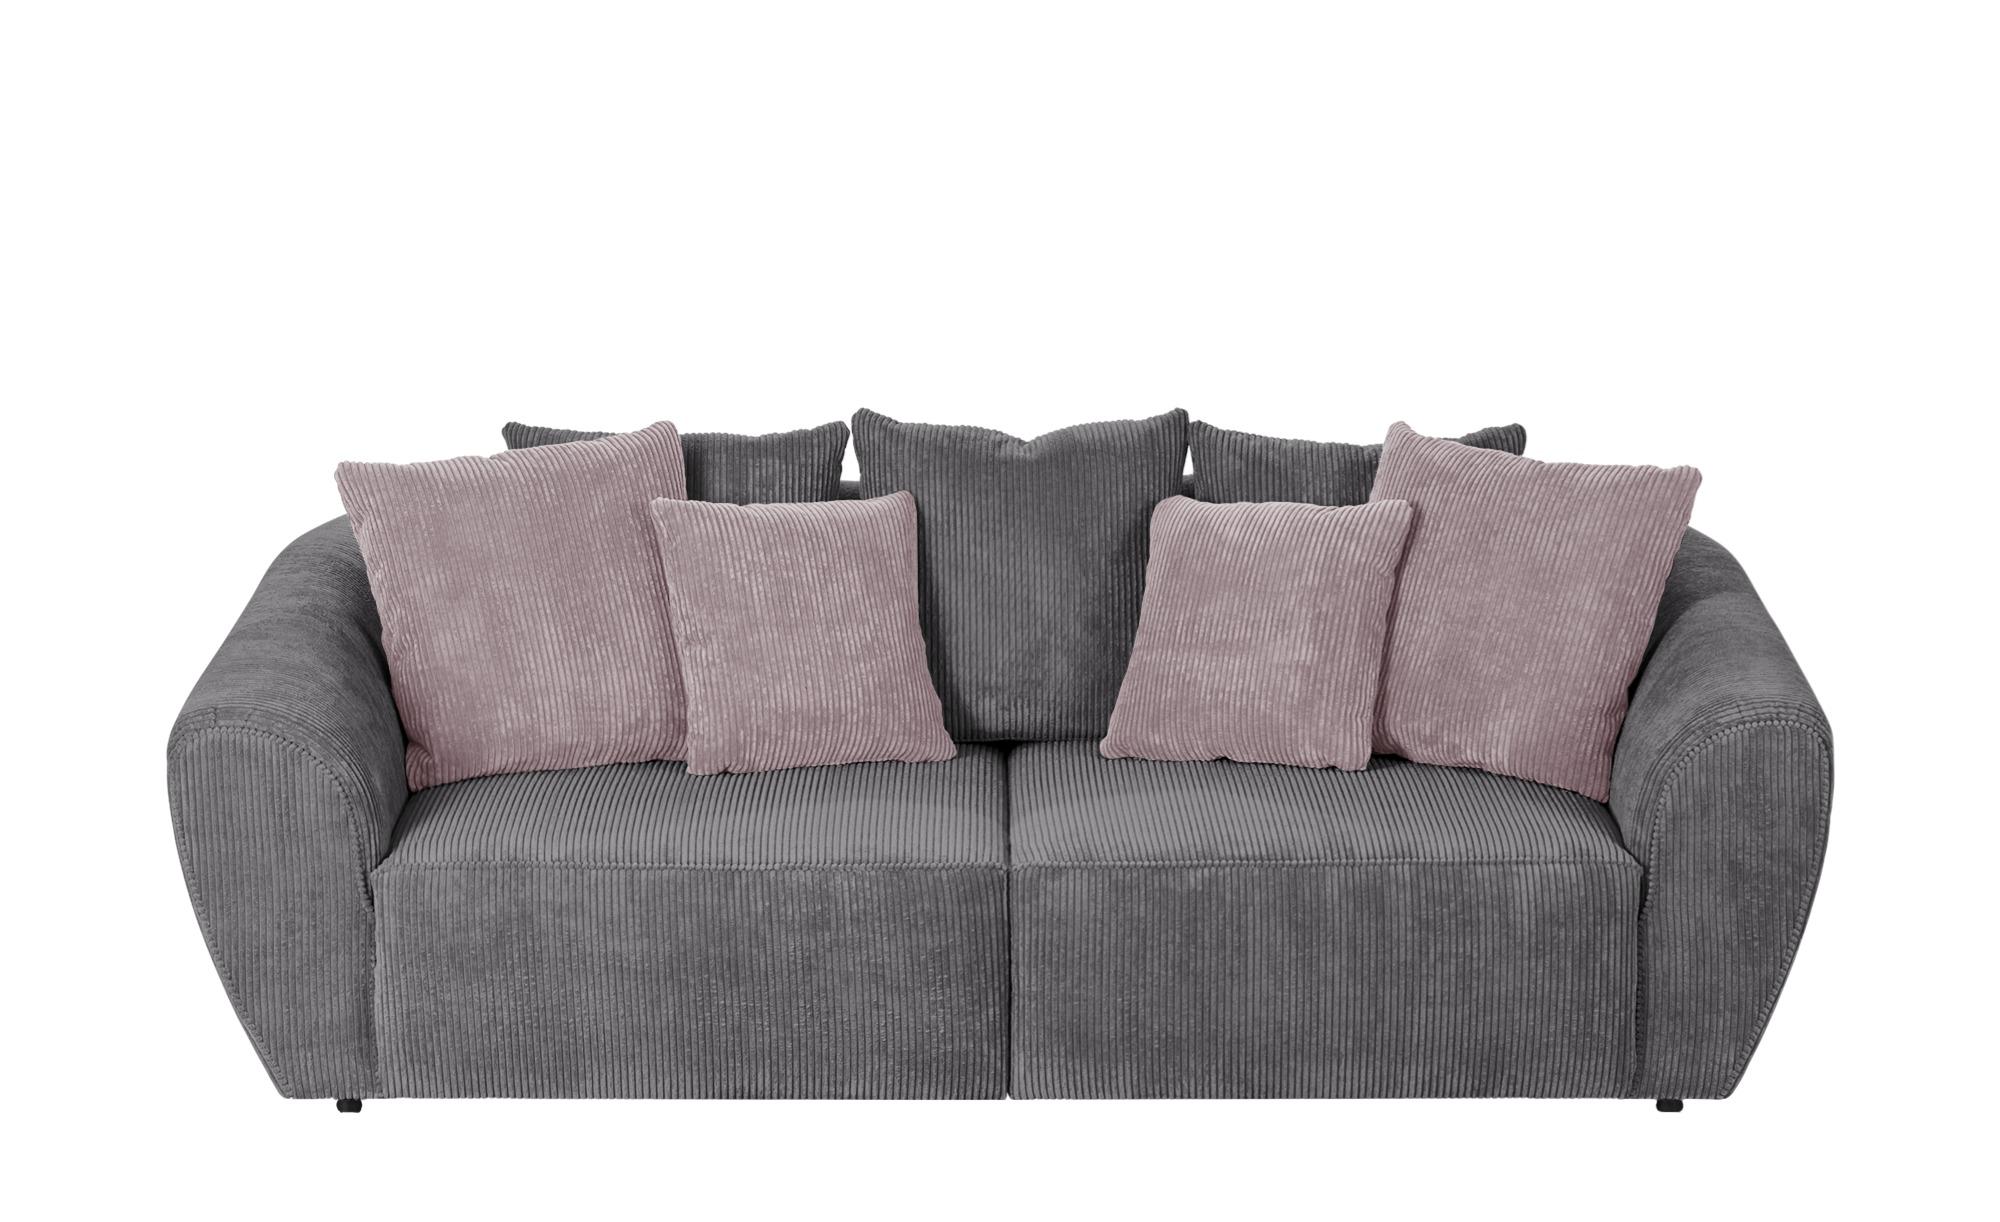 smart Big Sofa  Savita ¦ grau ¦ Maße (cm): B: 255 H: 90 T: 113 Polstermöbel > Sofas > 3-Sitzer - Höffner